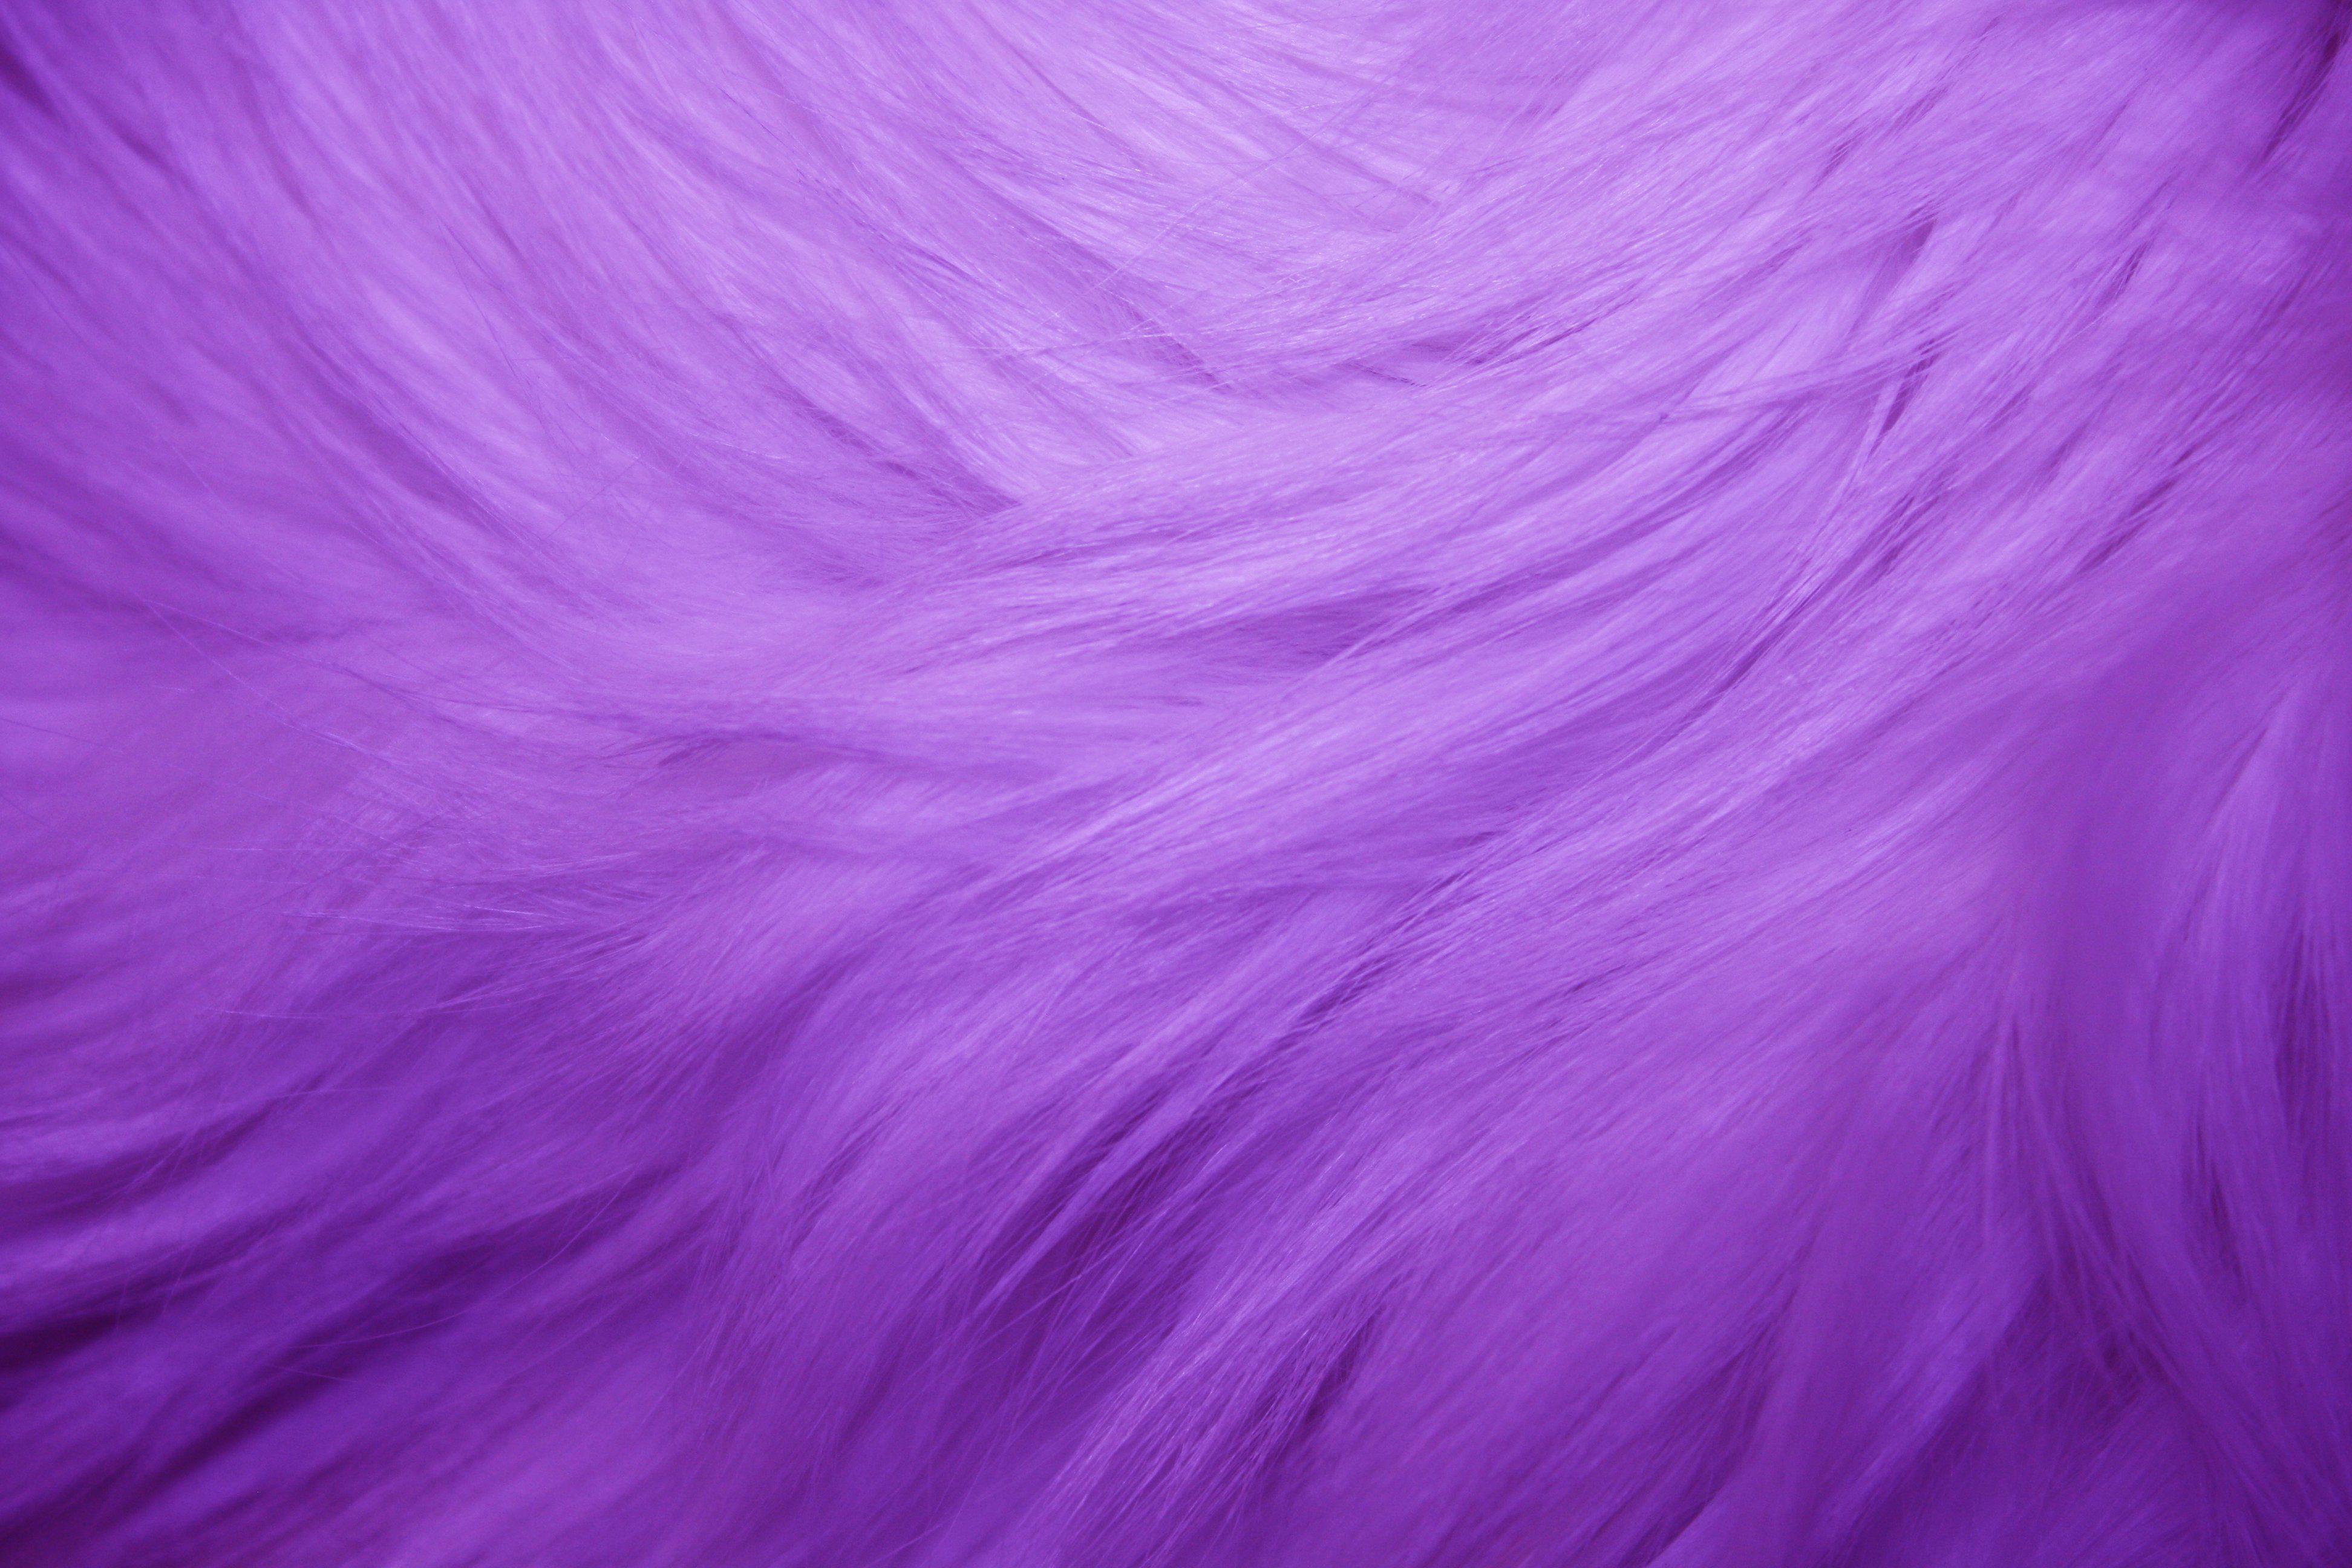 Purple Fur Texture With Images Fur Textures Purple Pink Fur